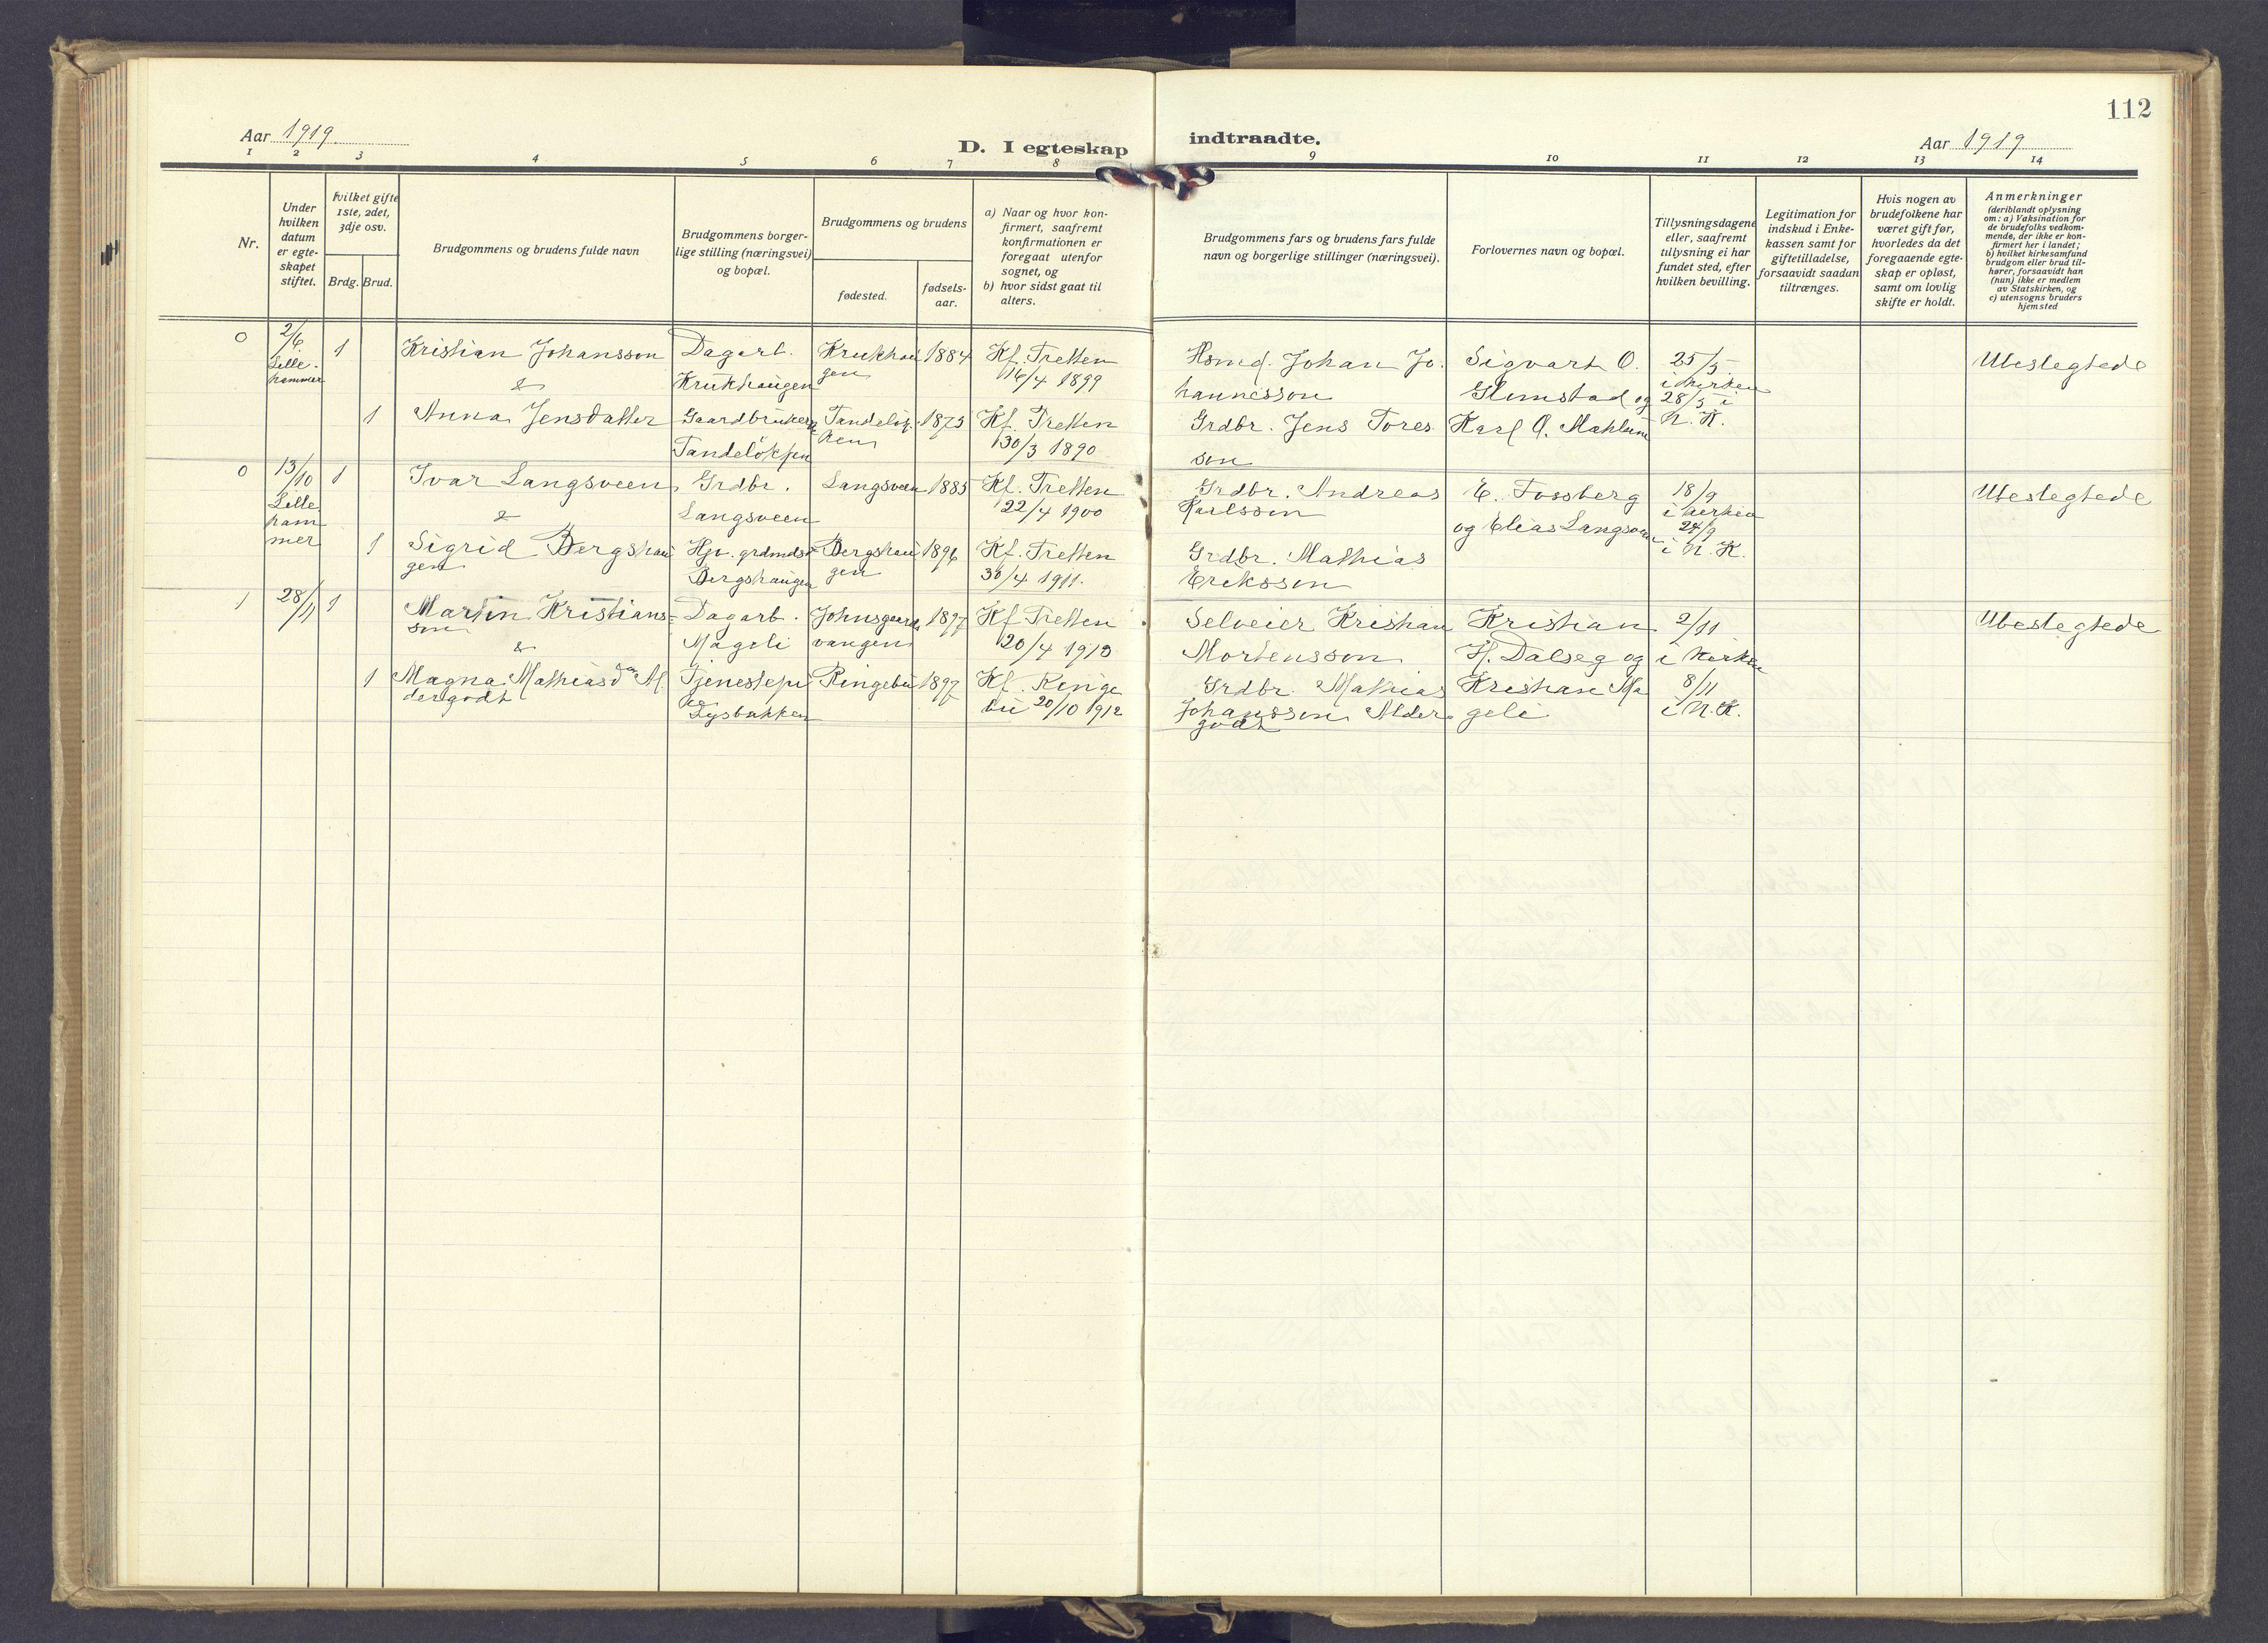 SAH, Øyer prestekontor, Ministerialbok nr. 14, 1919-1932, s. 112